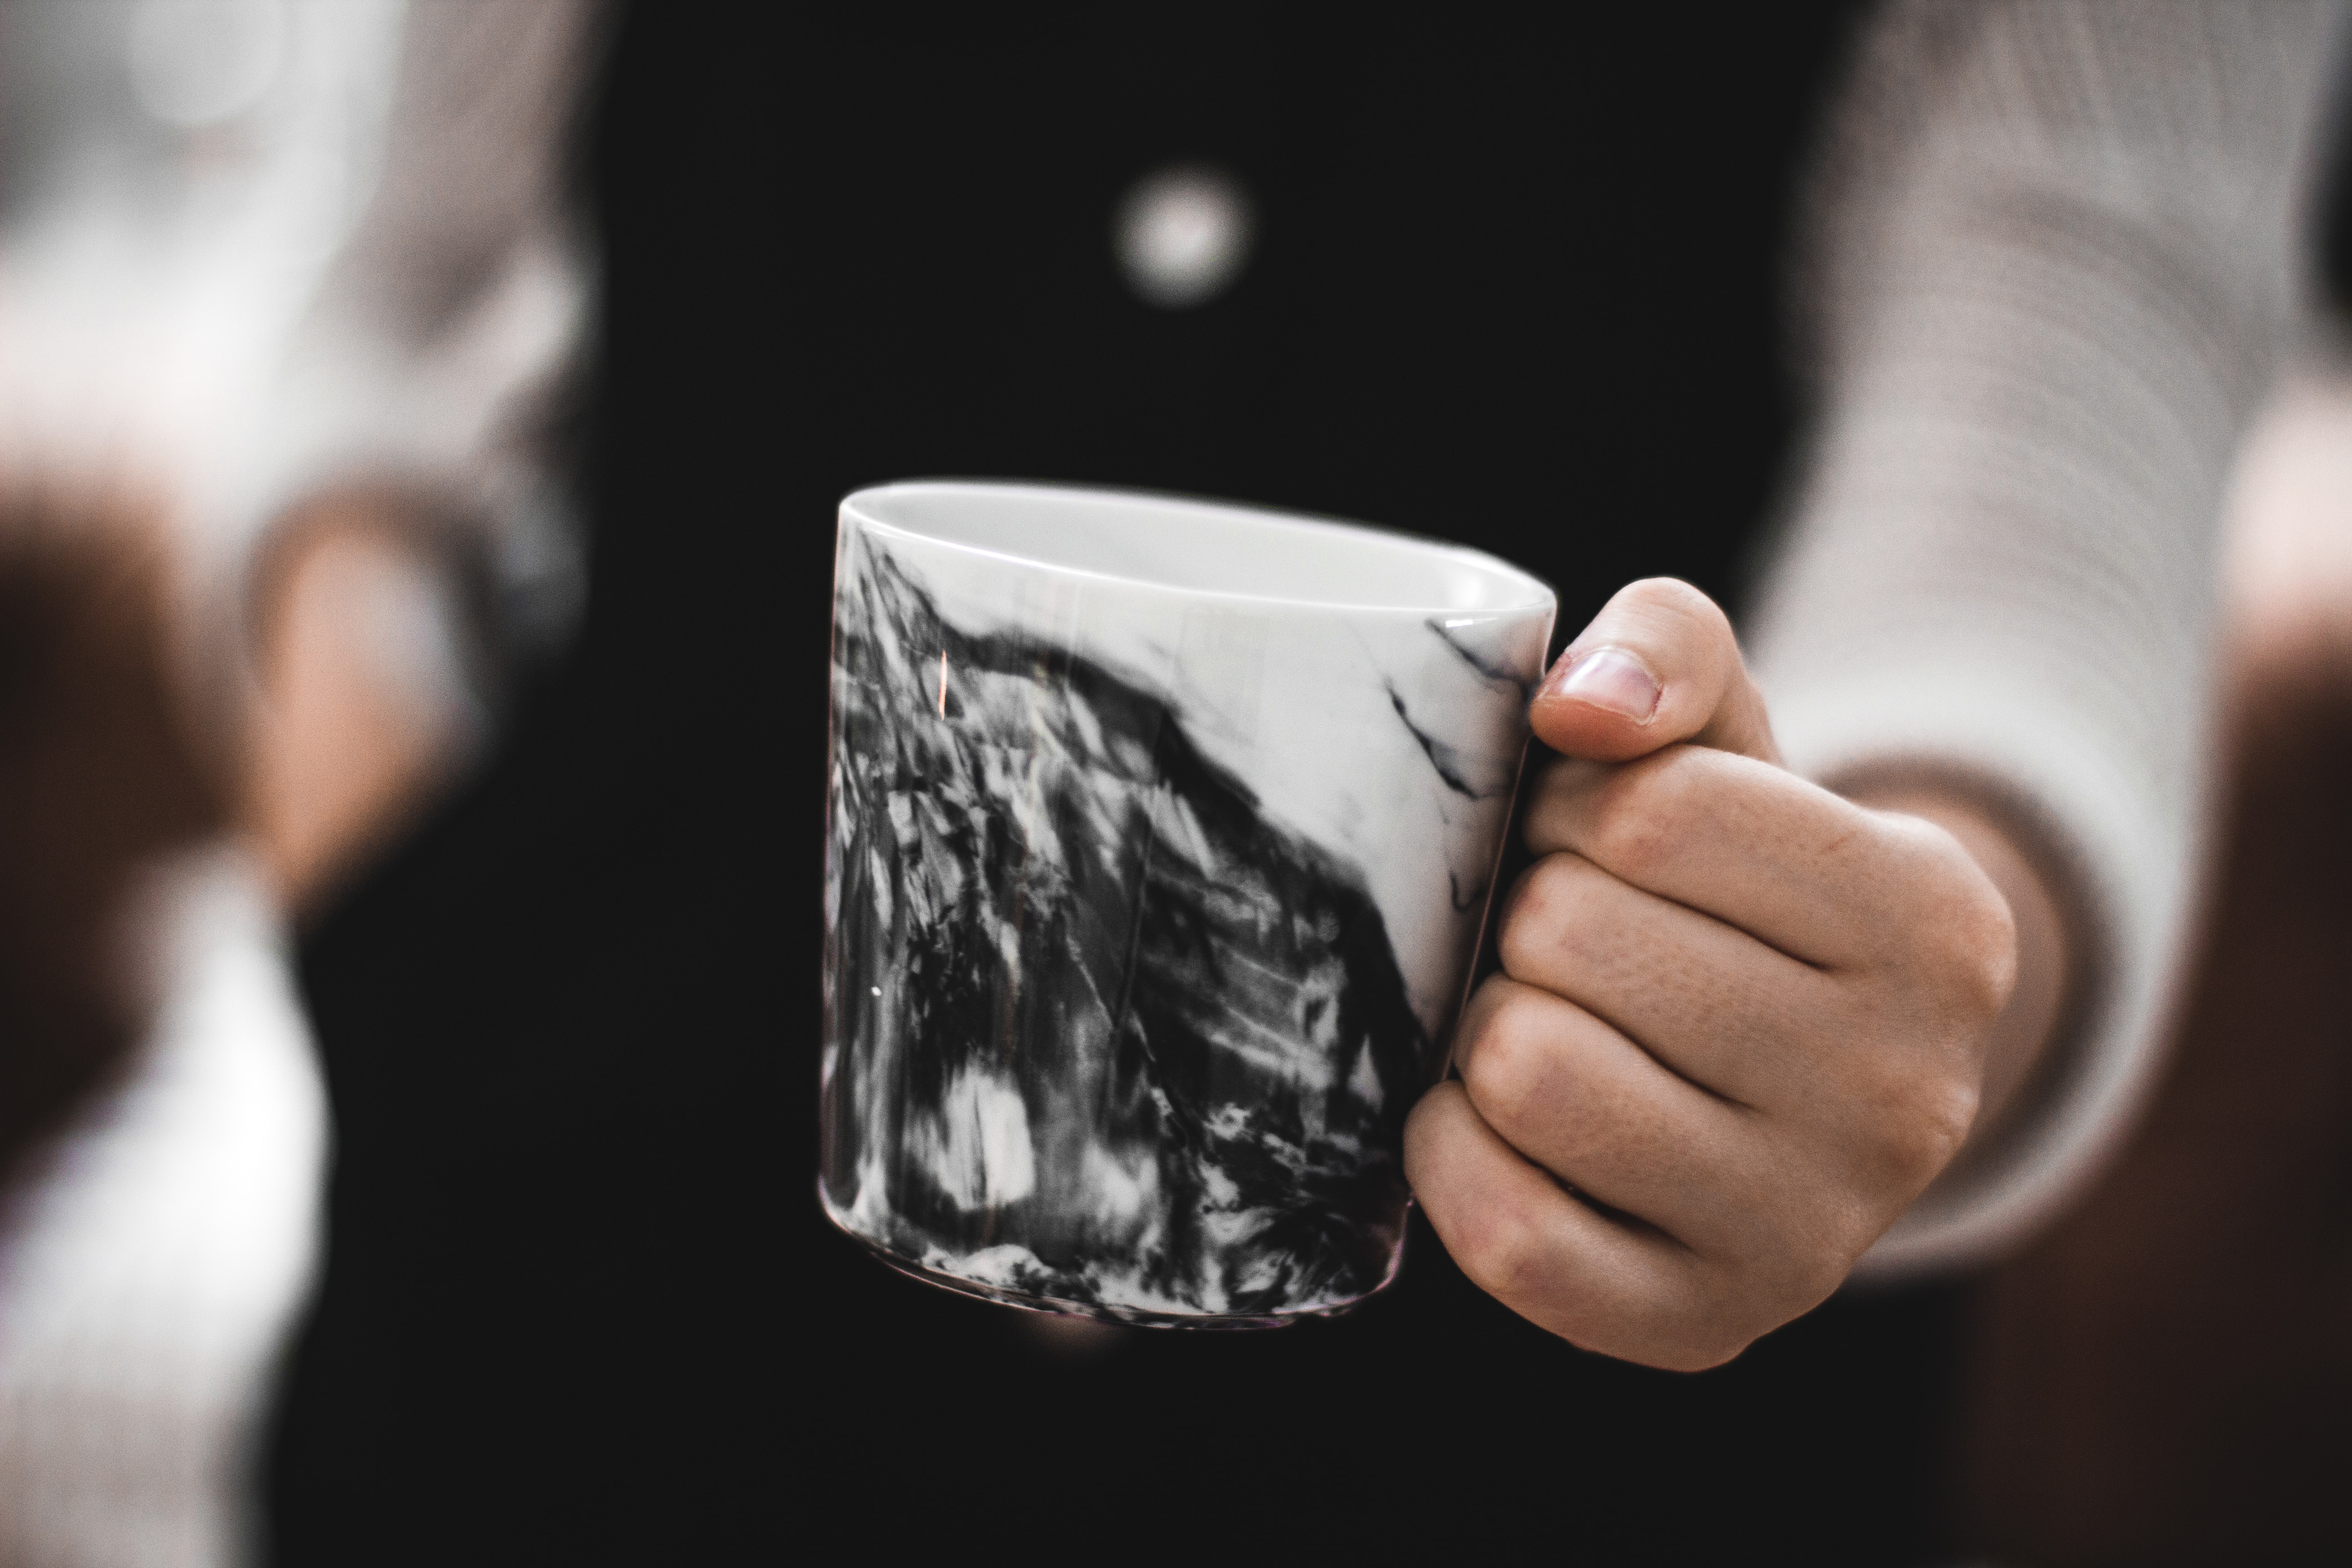 person holding a white and black ceramic mug